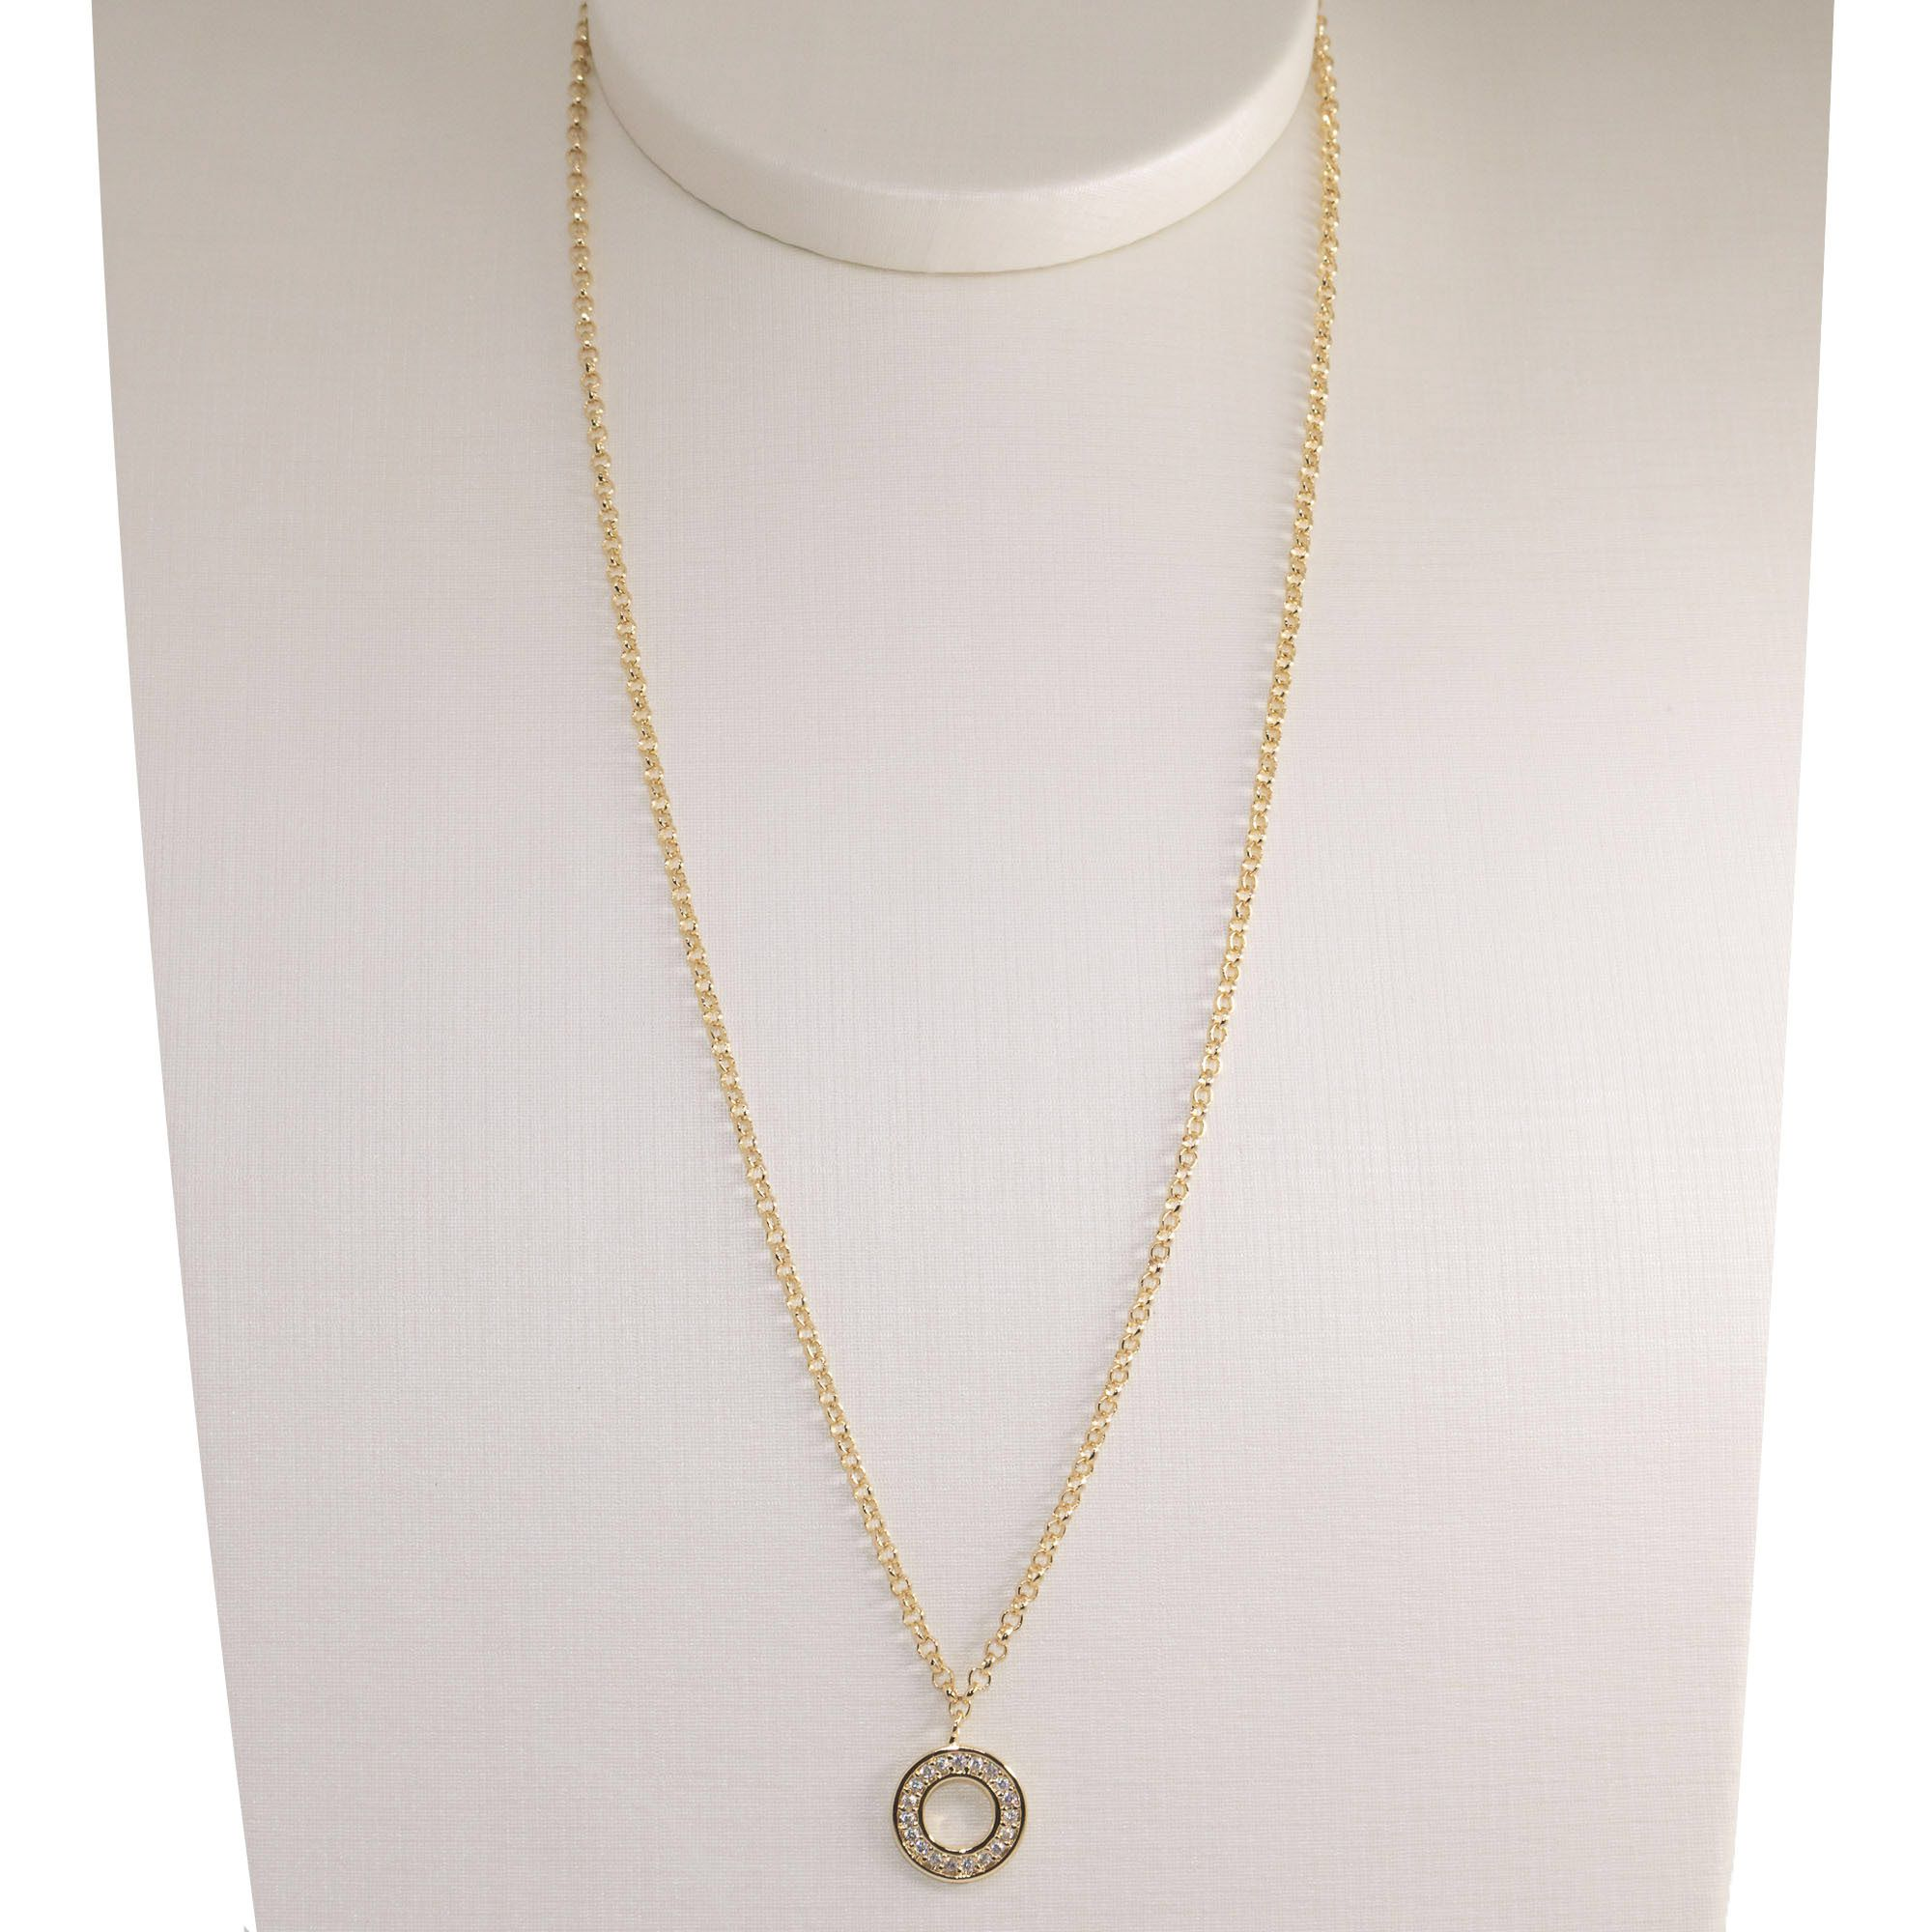 Gargantilha Semi joia  círculo Mimos banhada a ouro 18k ou rhodium